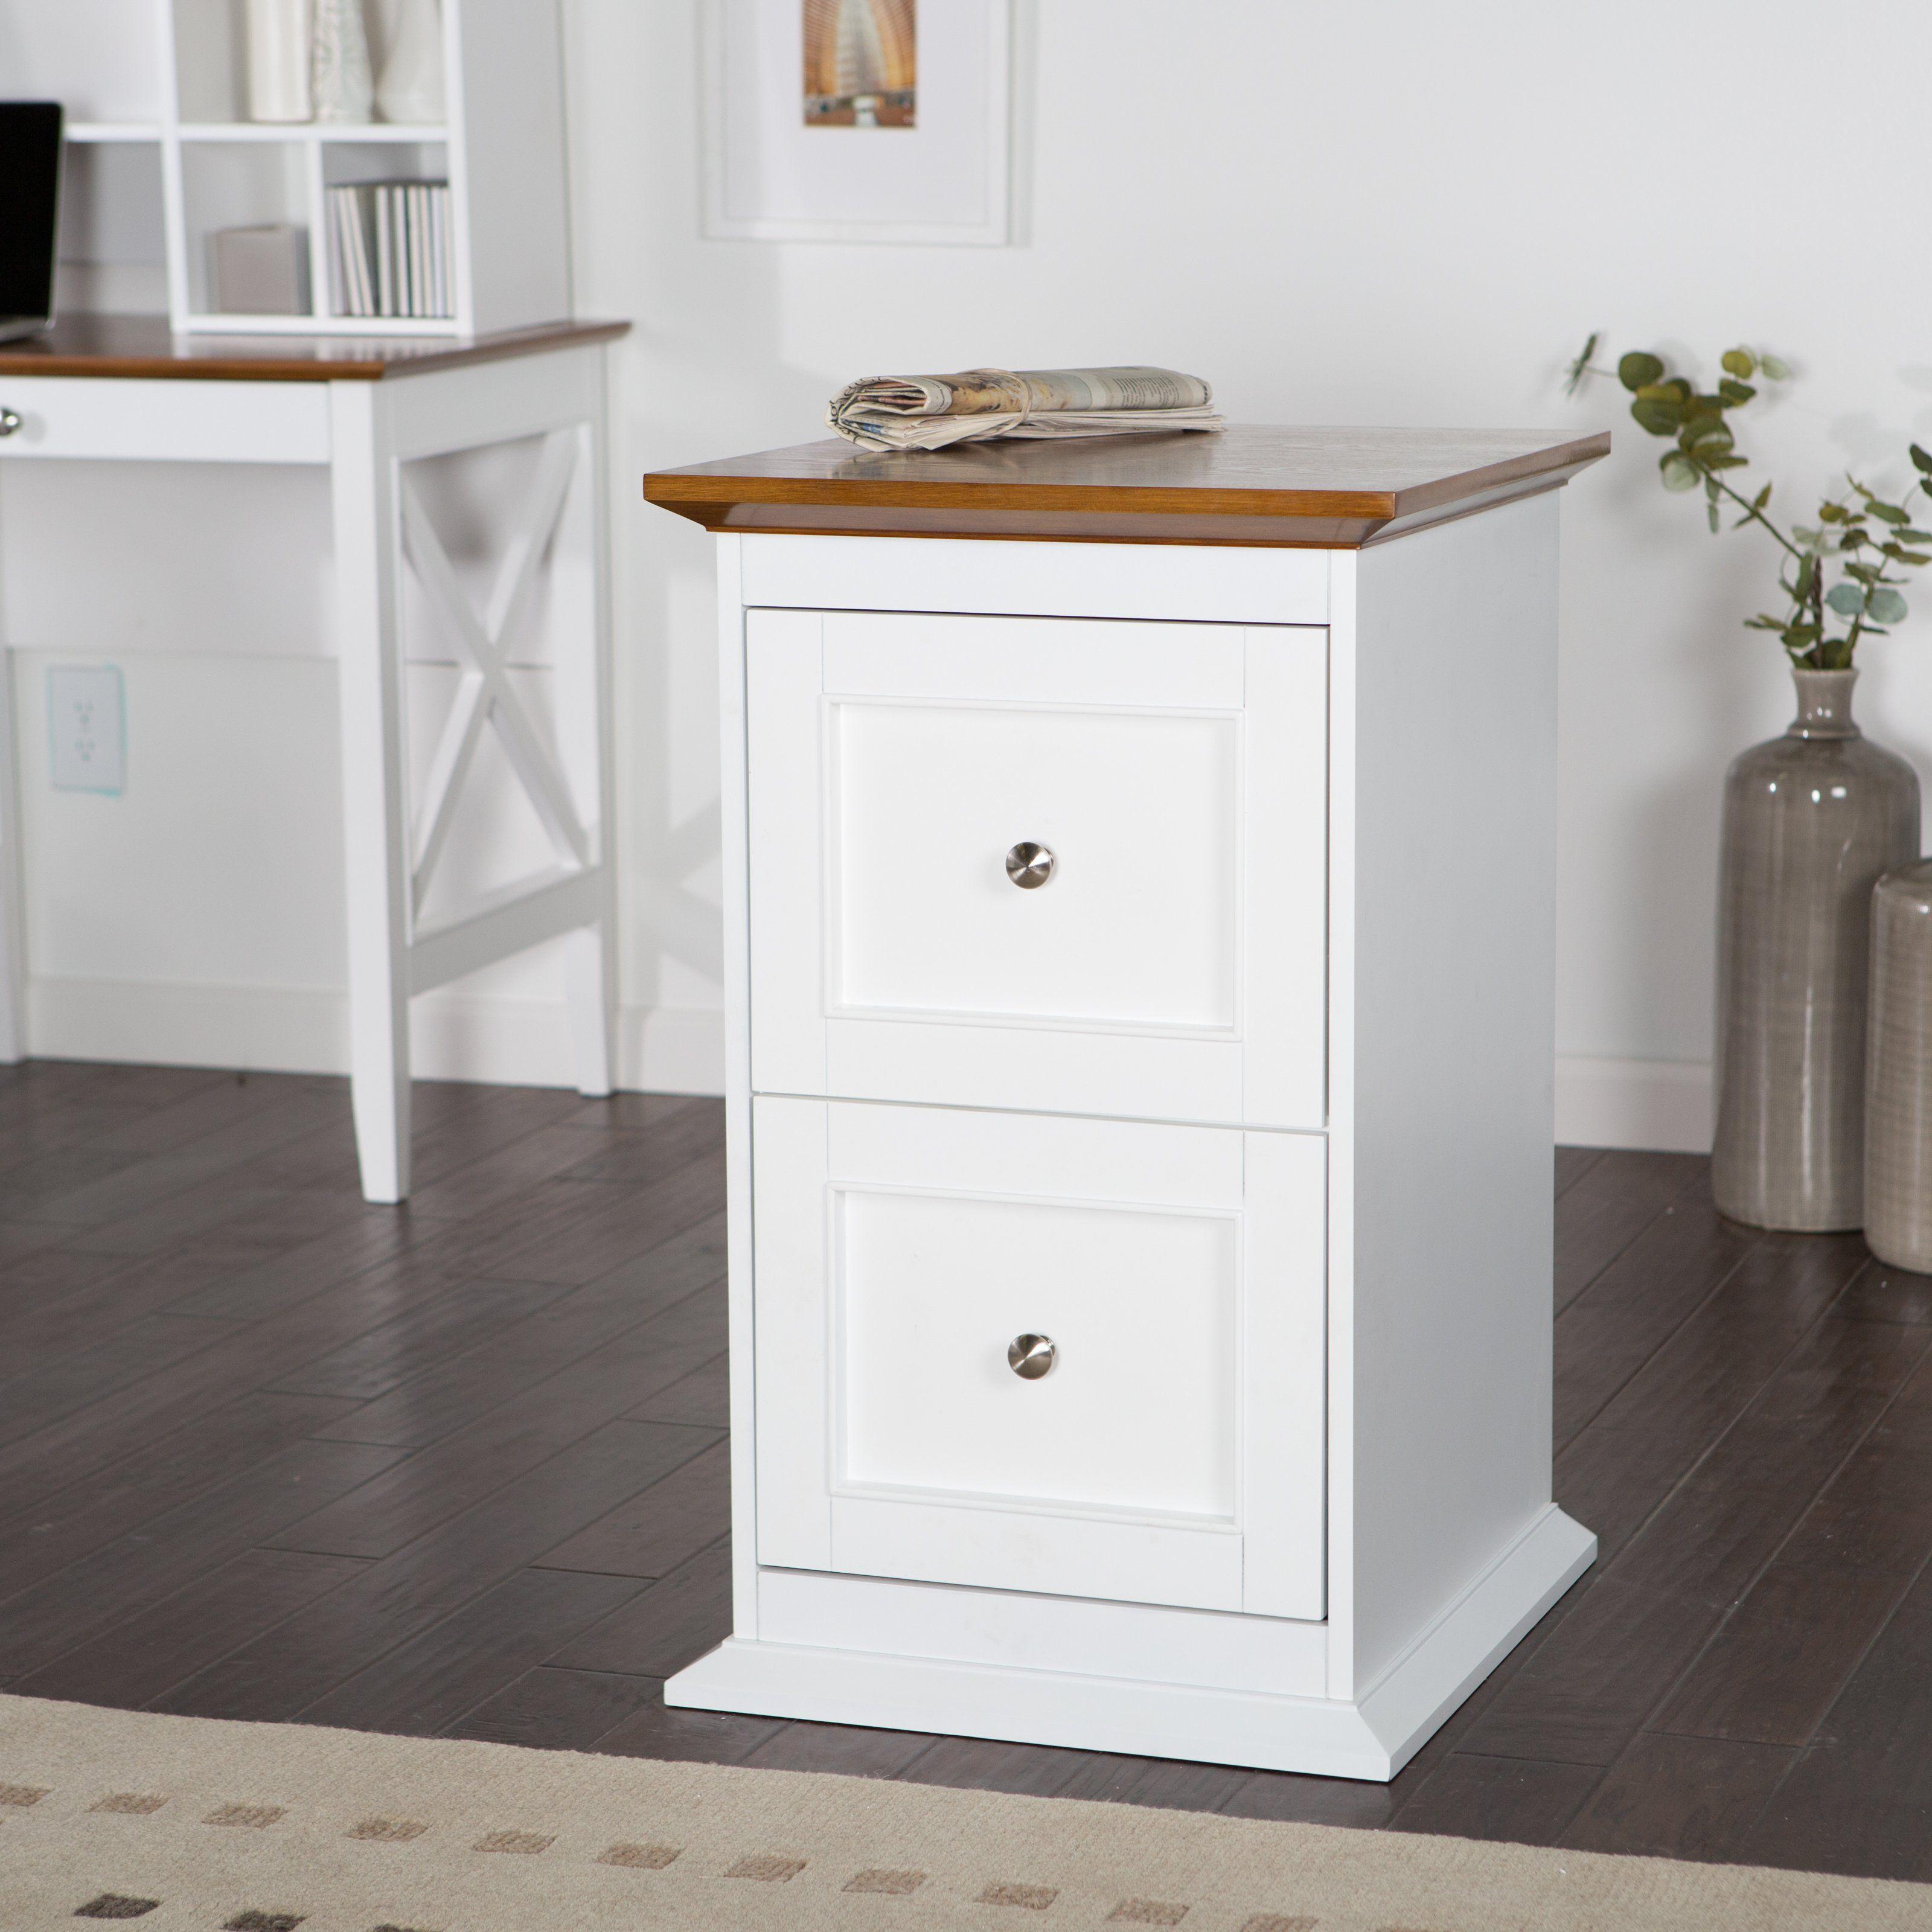 Belham Living Hampton Two Drawer Filing Cabinet White Oak 179 98 Hayneedle Filing Cabinet Wooden File Cabinet Wood File Two drawer wooden file cabinet